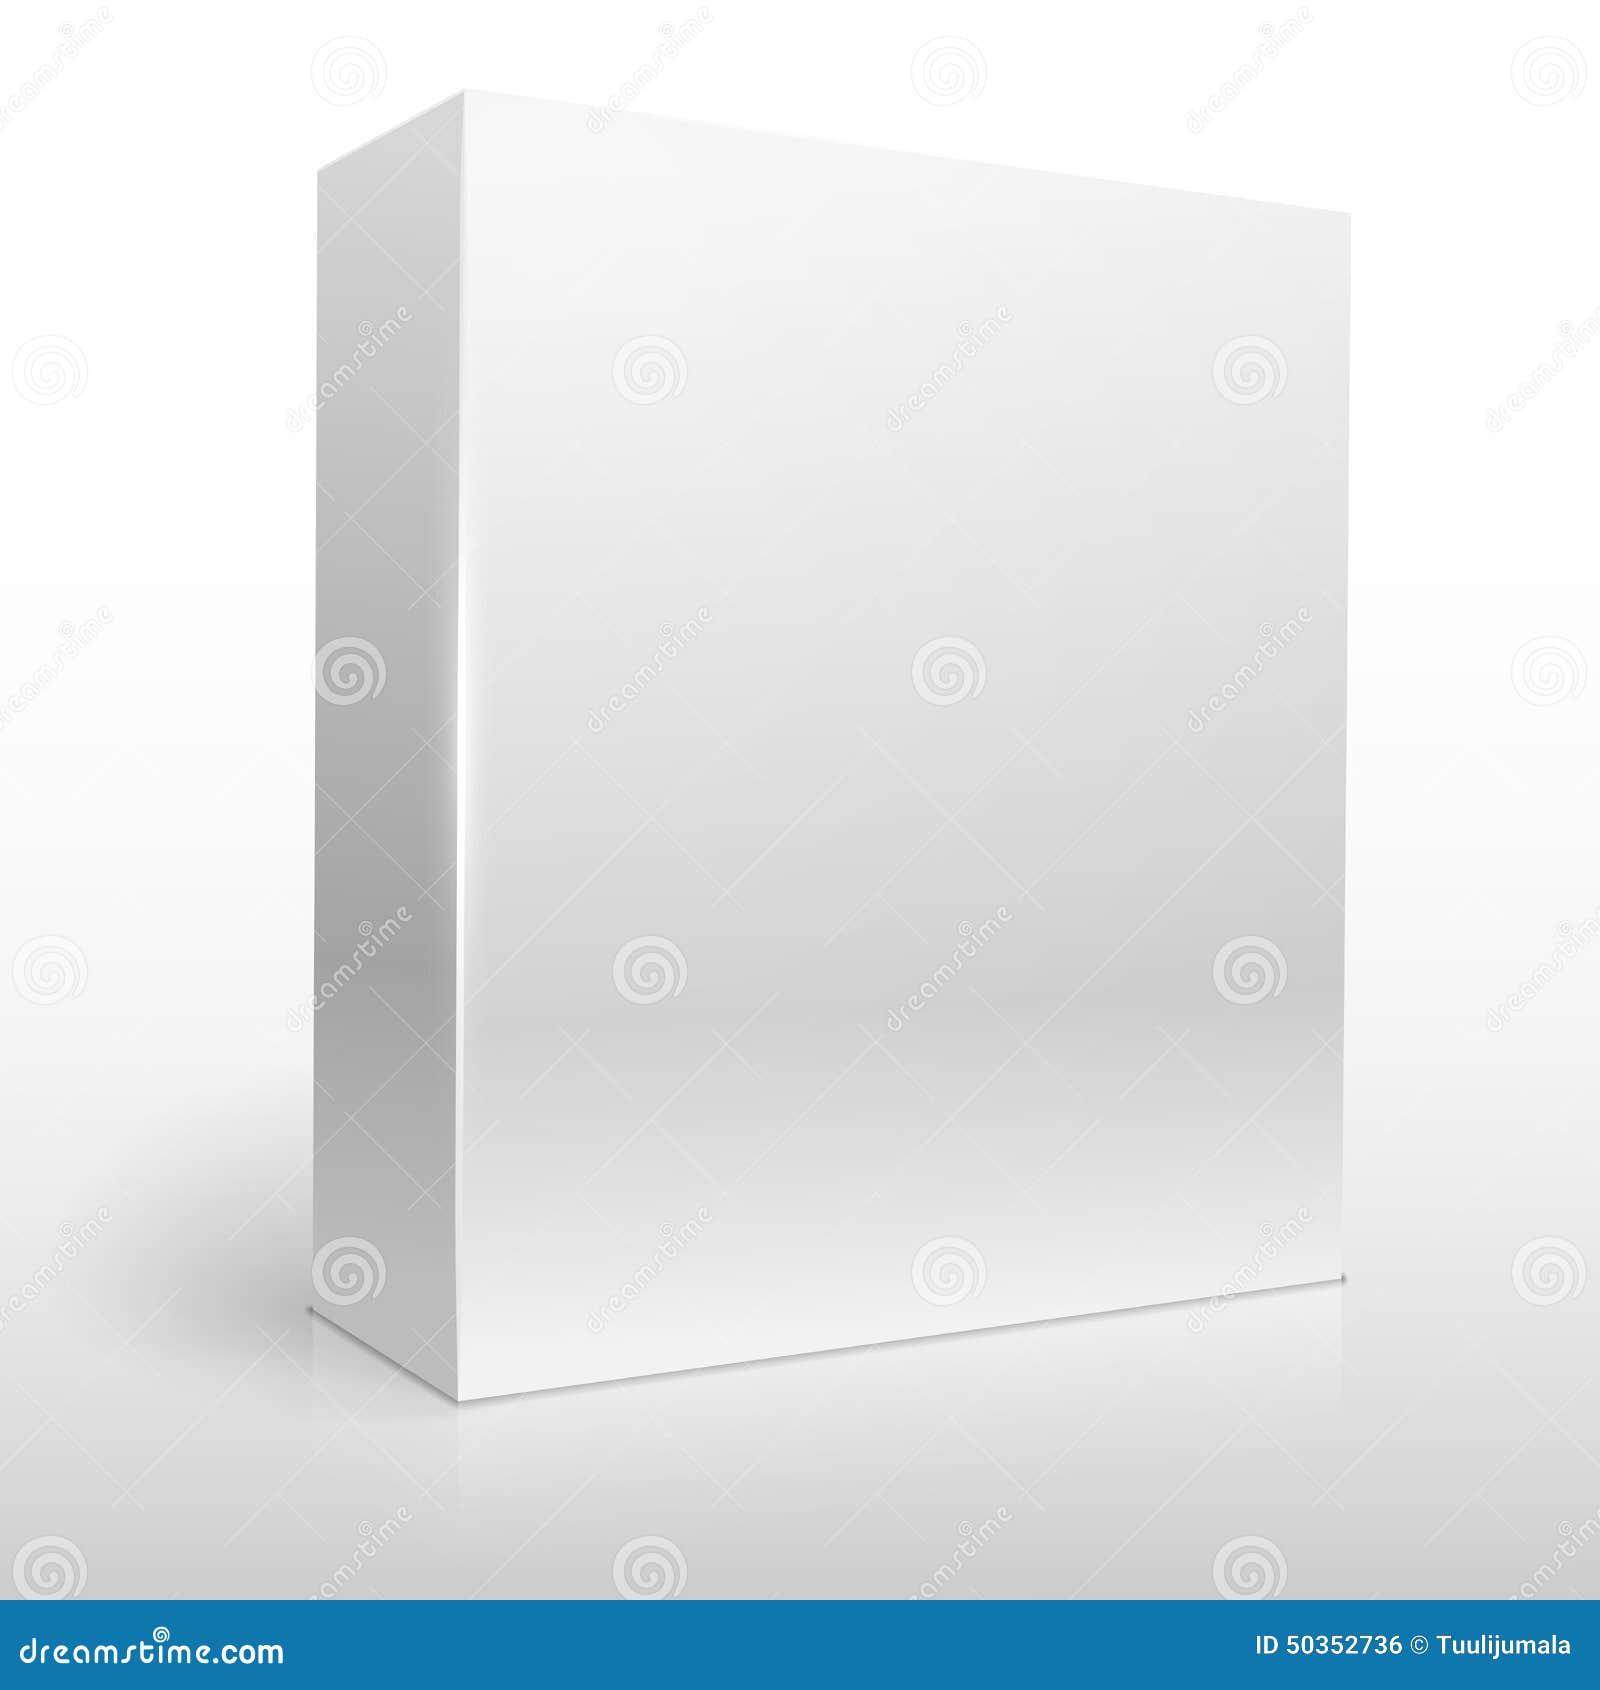 Software Box Stock Vector. Illustration Of Cardboard